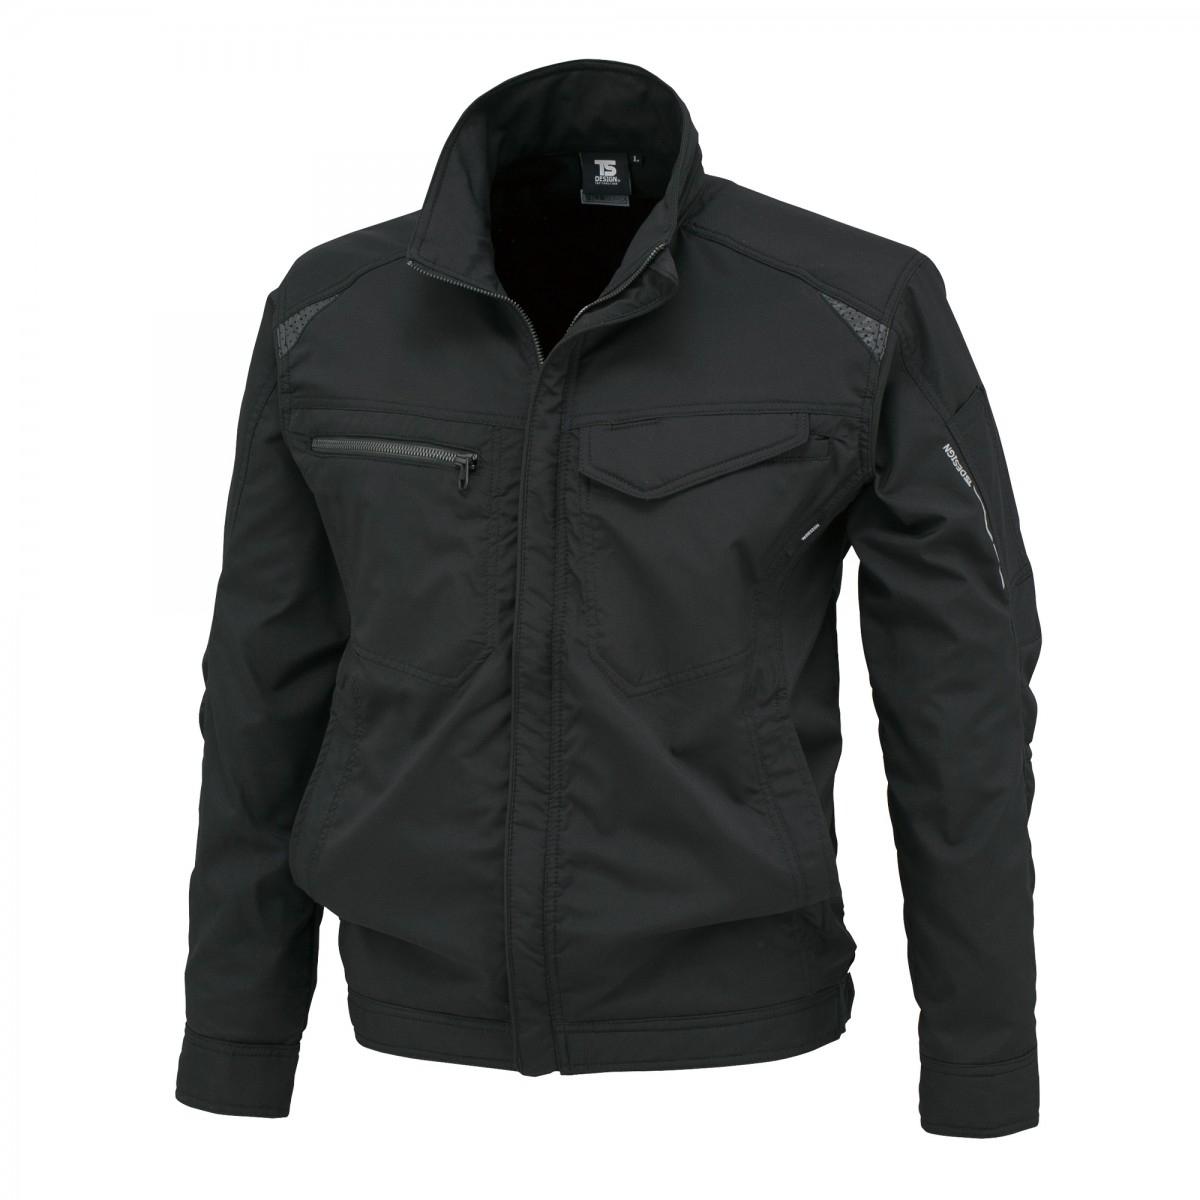 TS DESIGN 84636 ジャケット ¥5,280(税込)95 ブラック